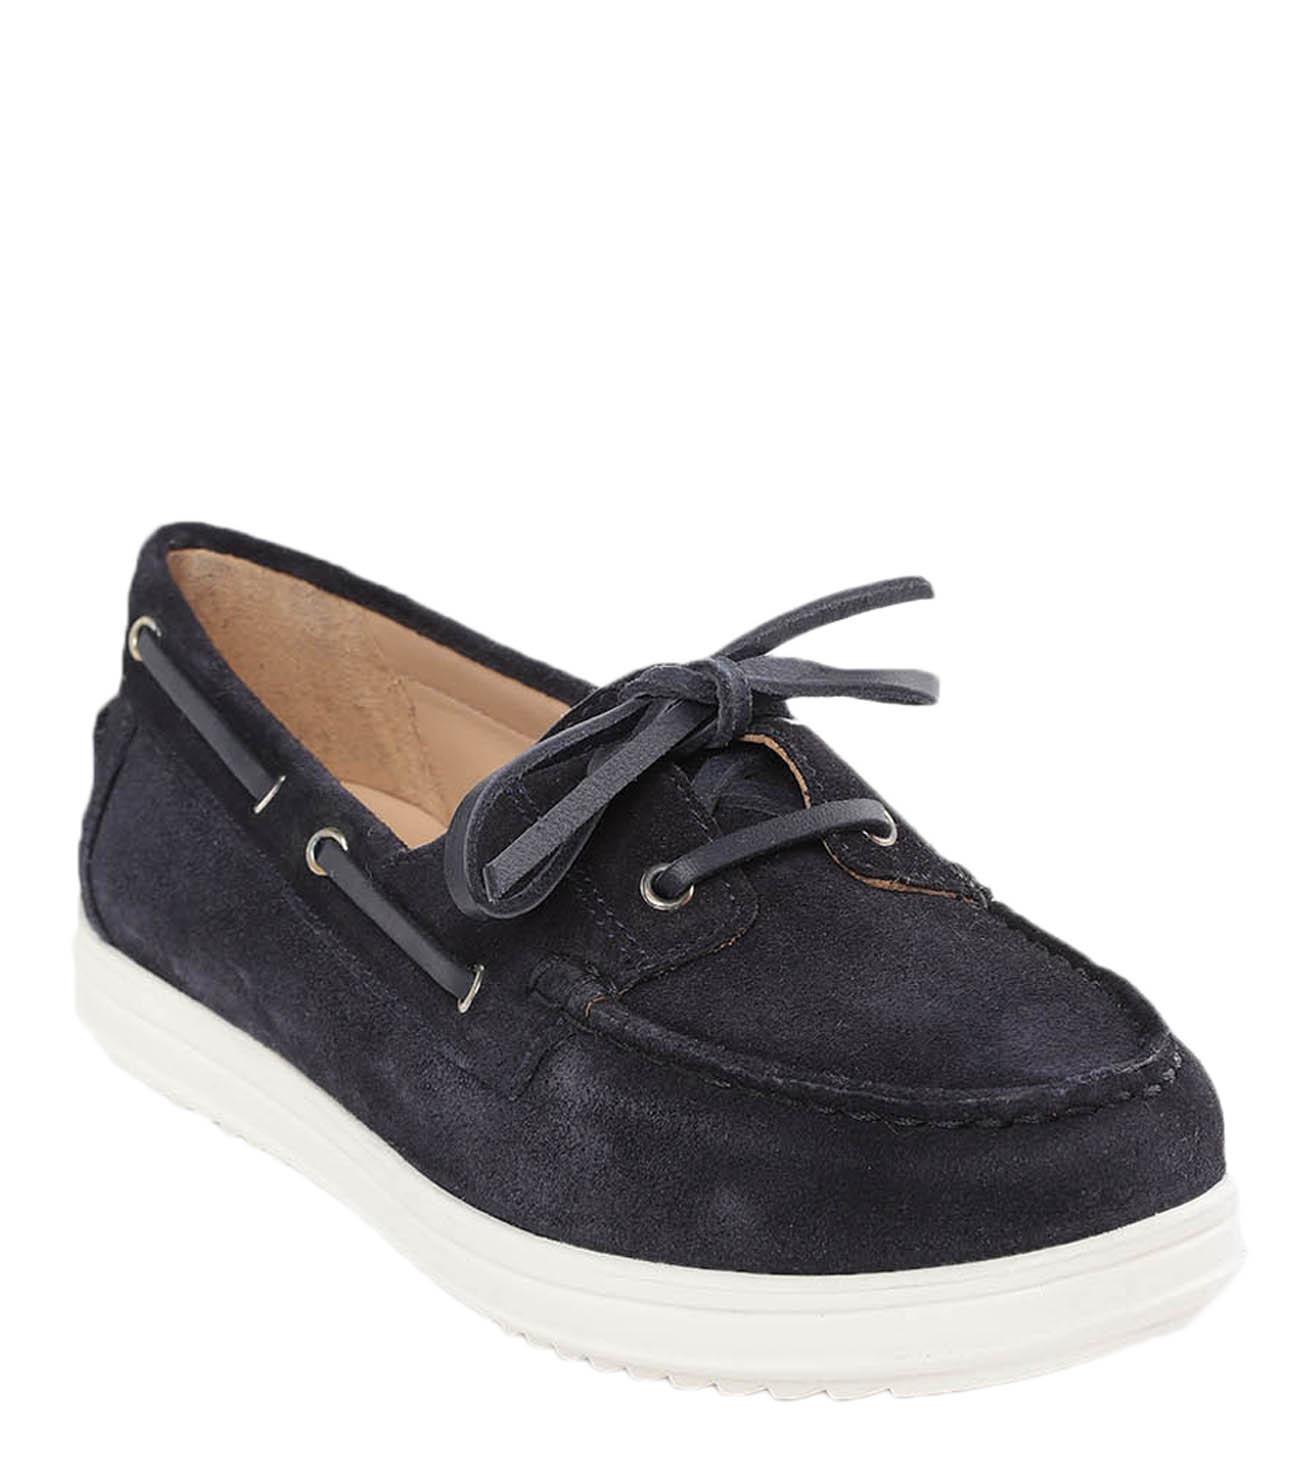 rene mancini shoes price Callaway Men s Coronado Golf Shoes DICK S Sporting Goods